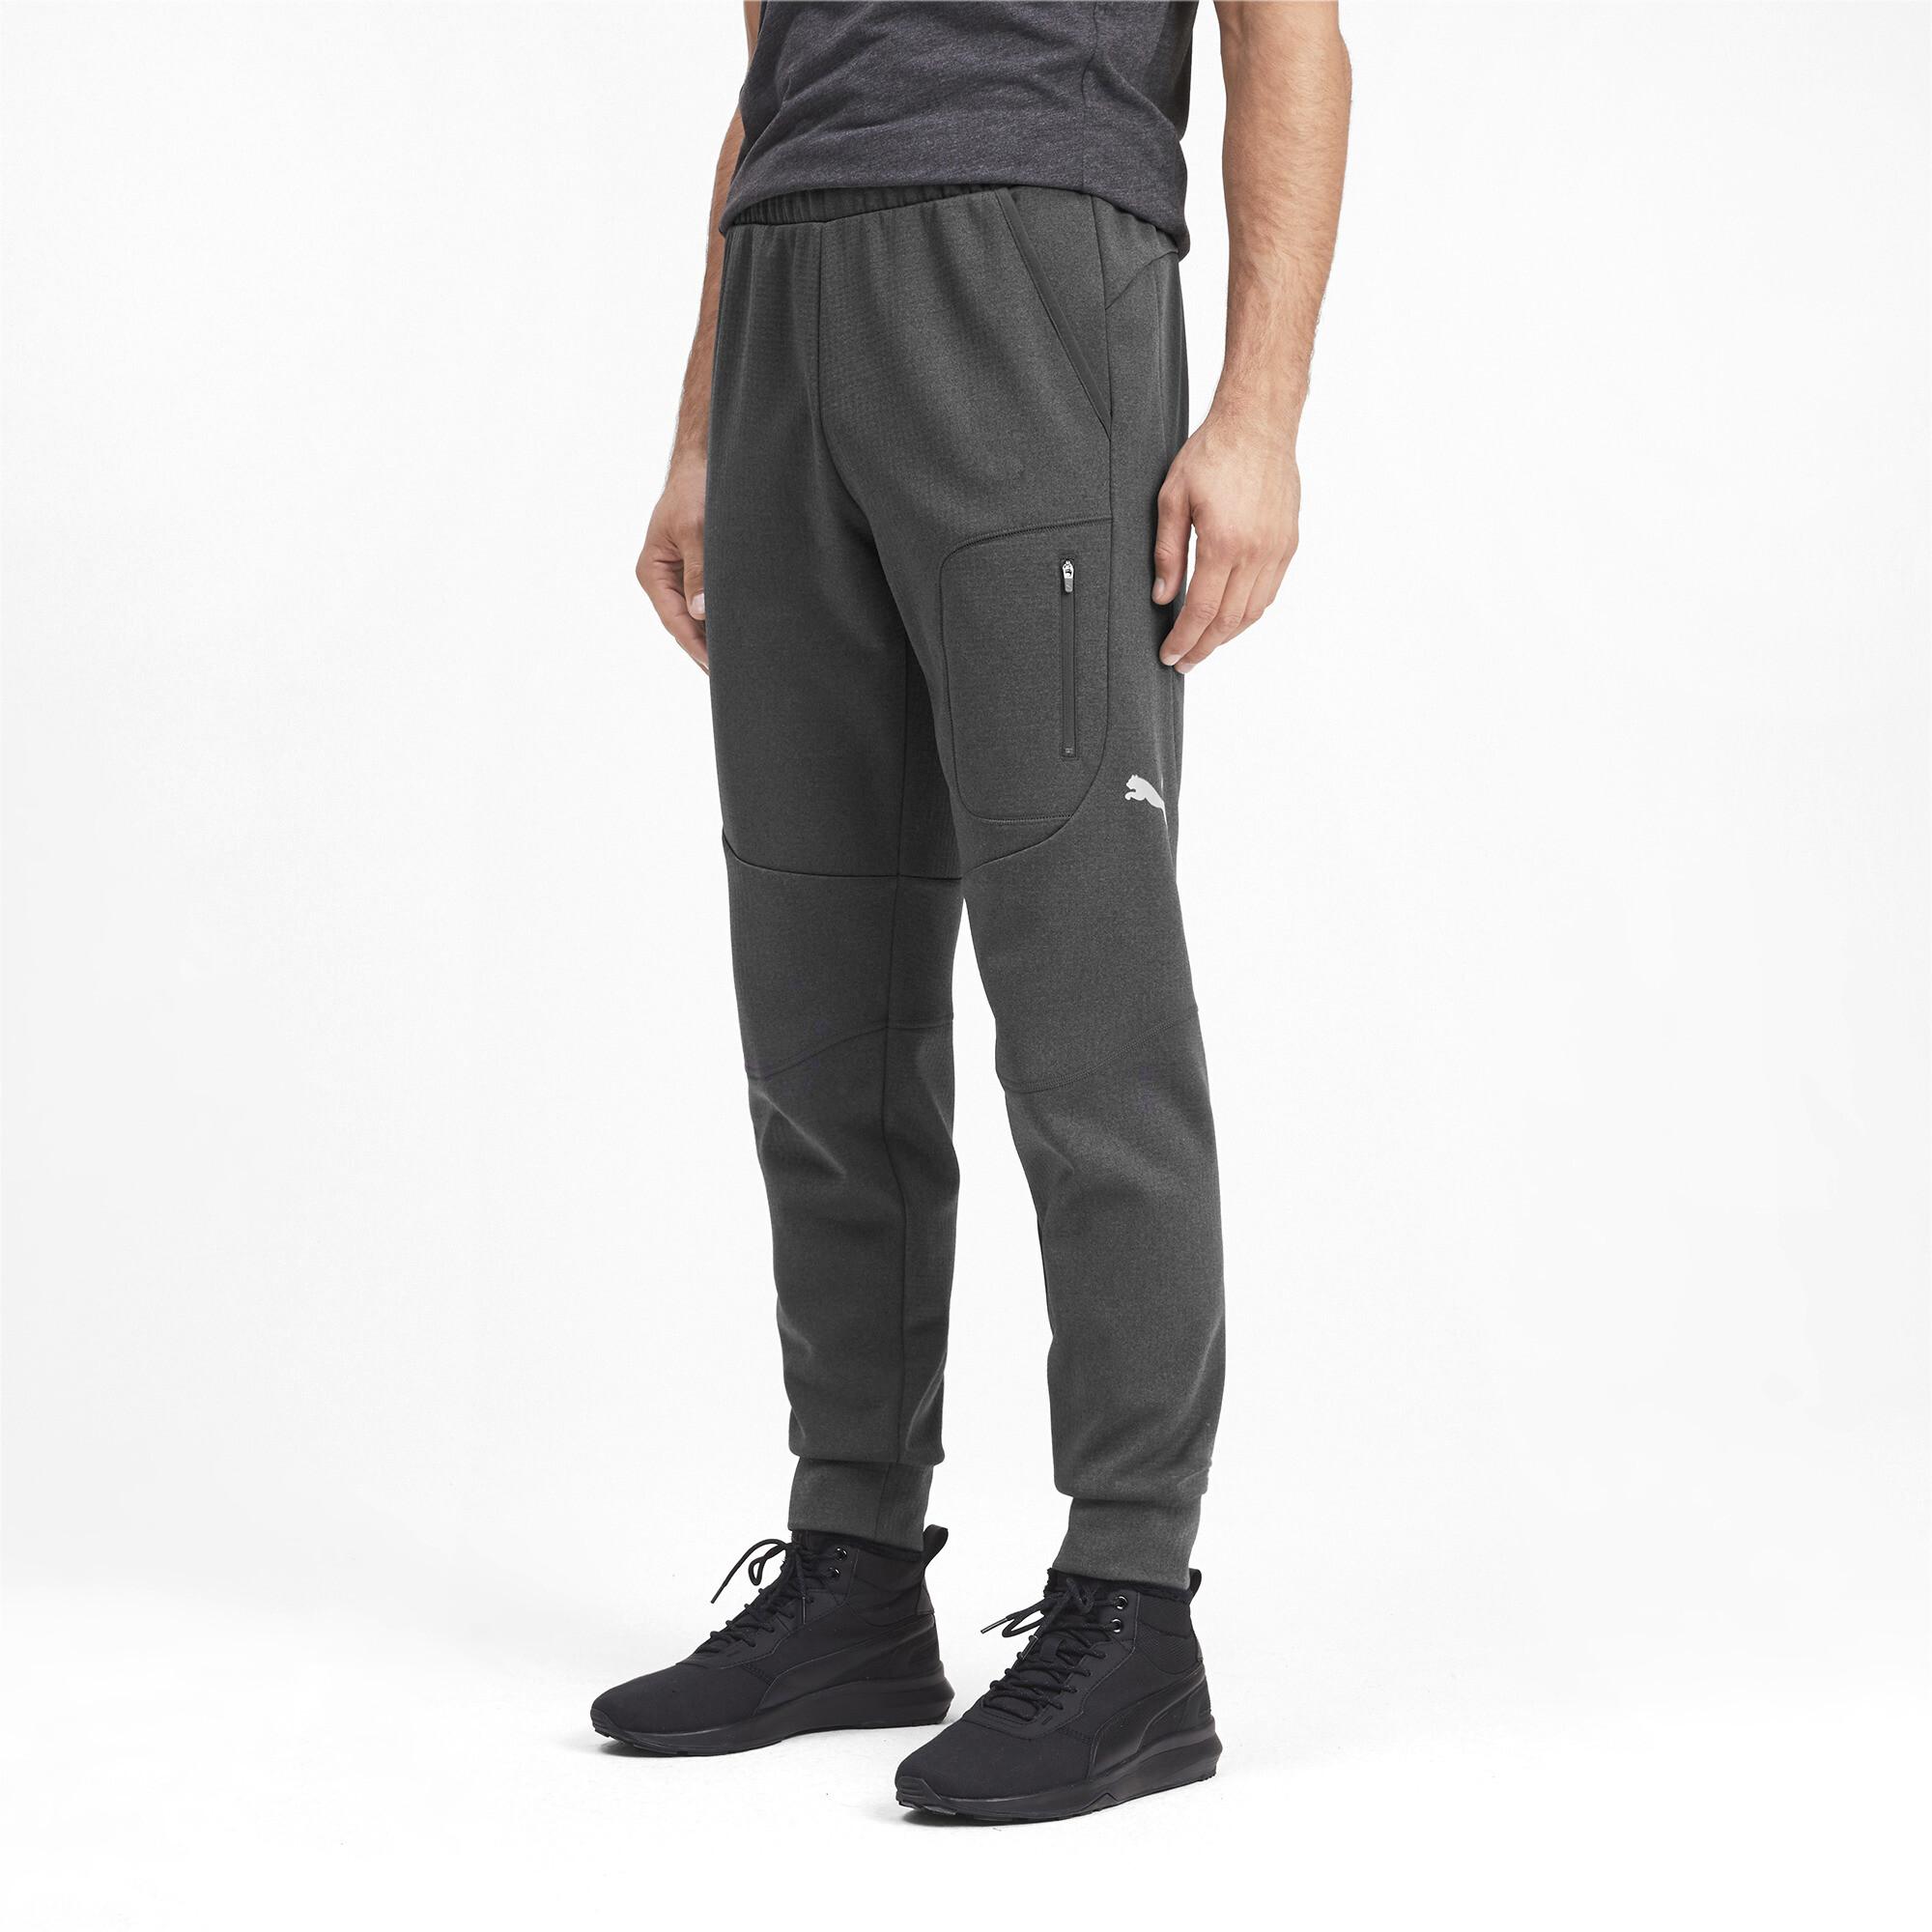 PUMA-Evostripe-Warm-Men-039-s-Pants-Men-Knitted-Pants-Basics miniatura 4